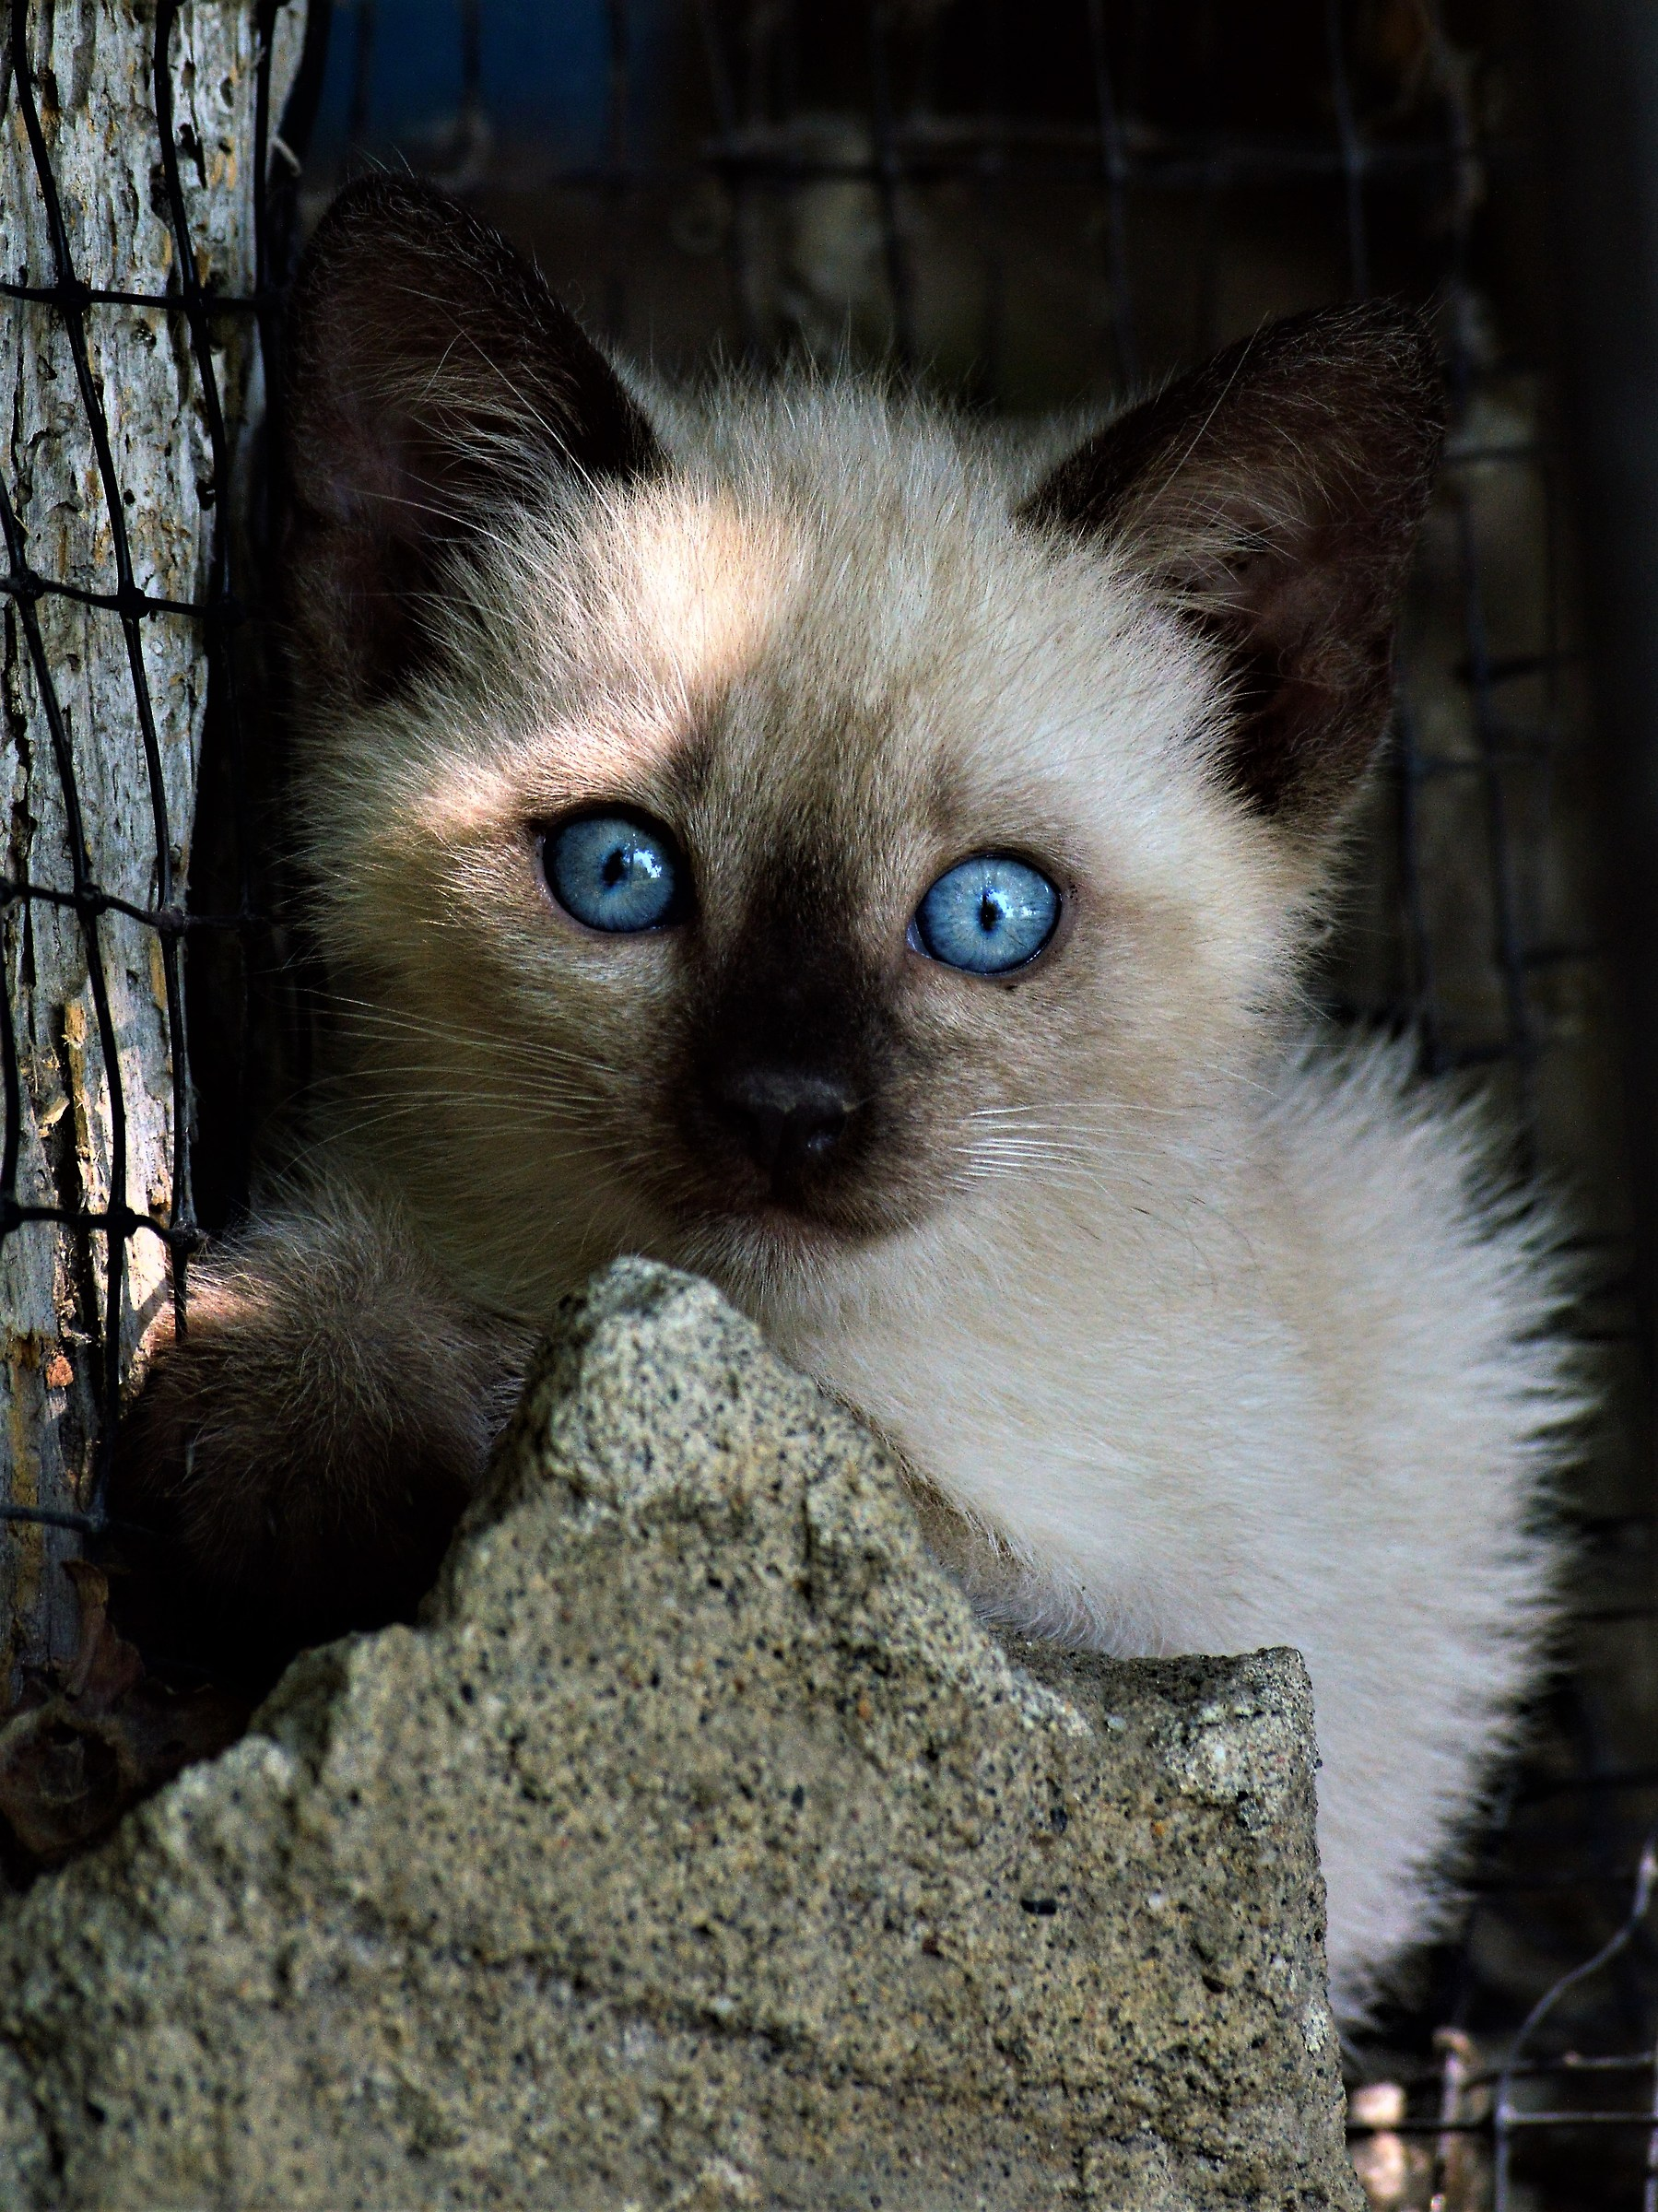 Feline mimicry...